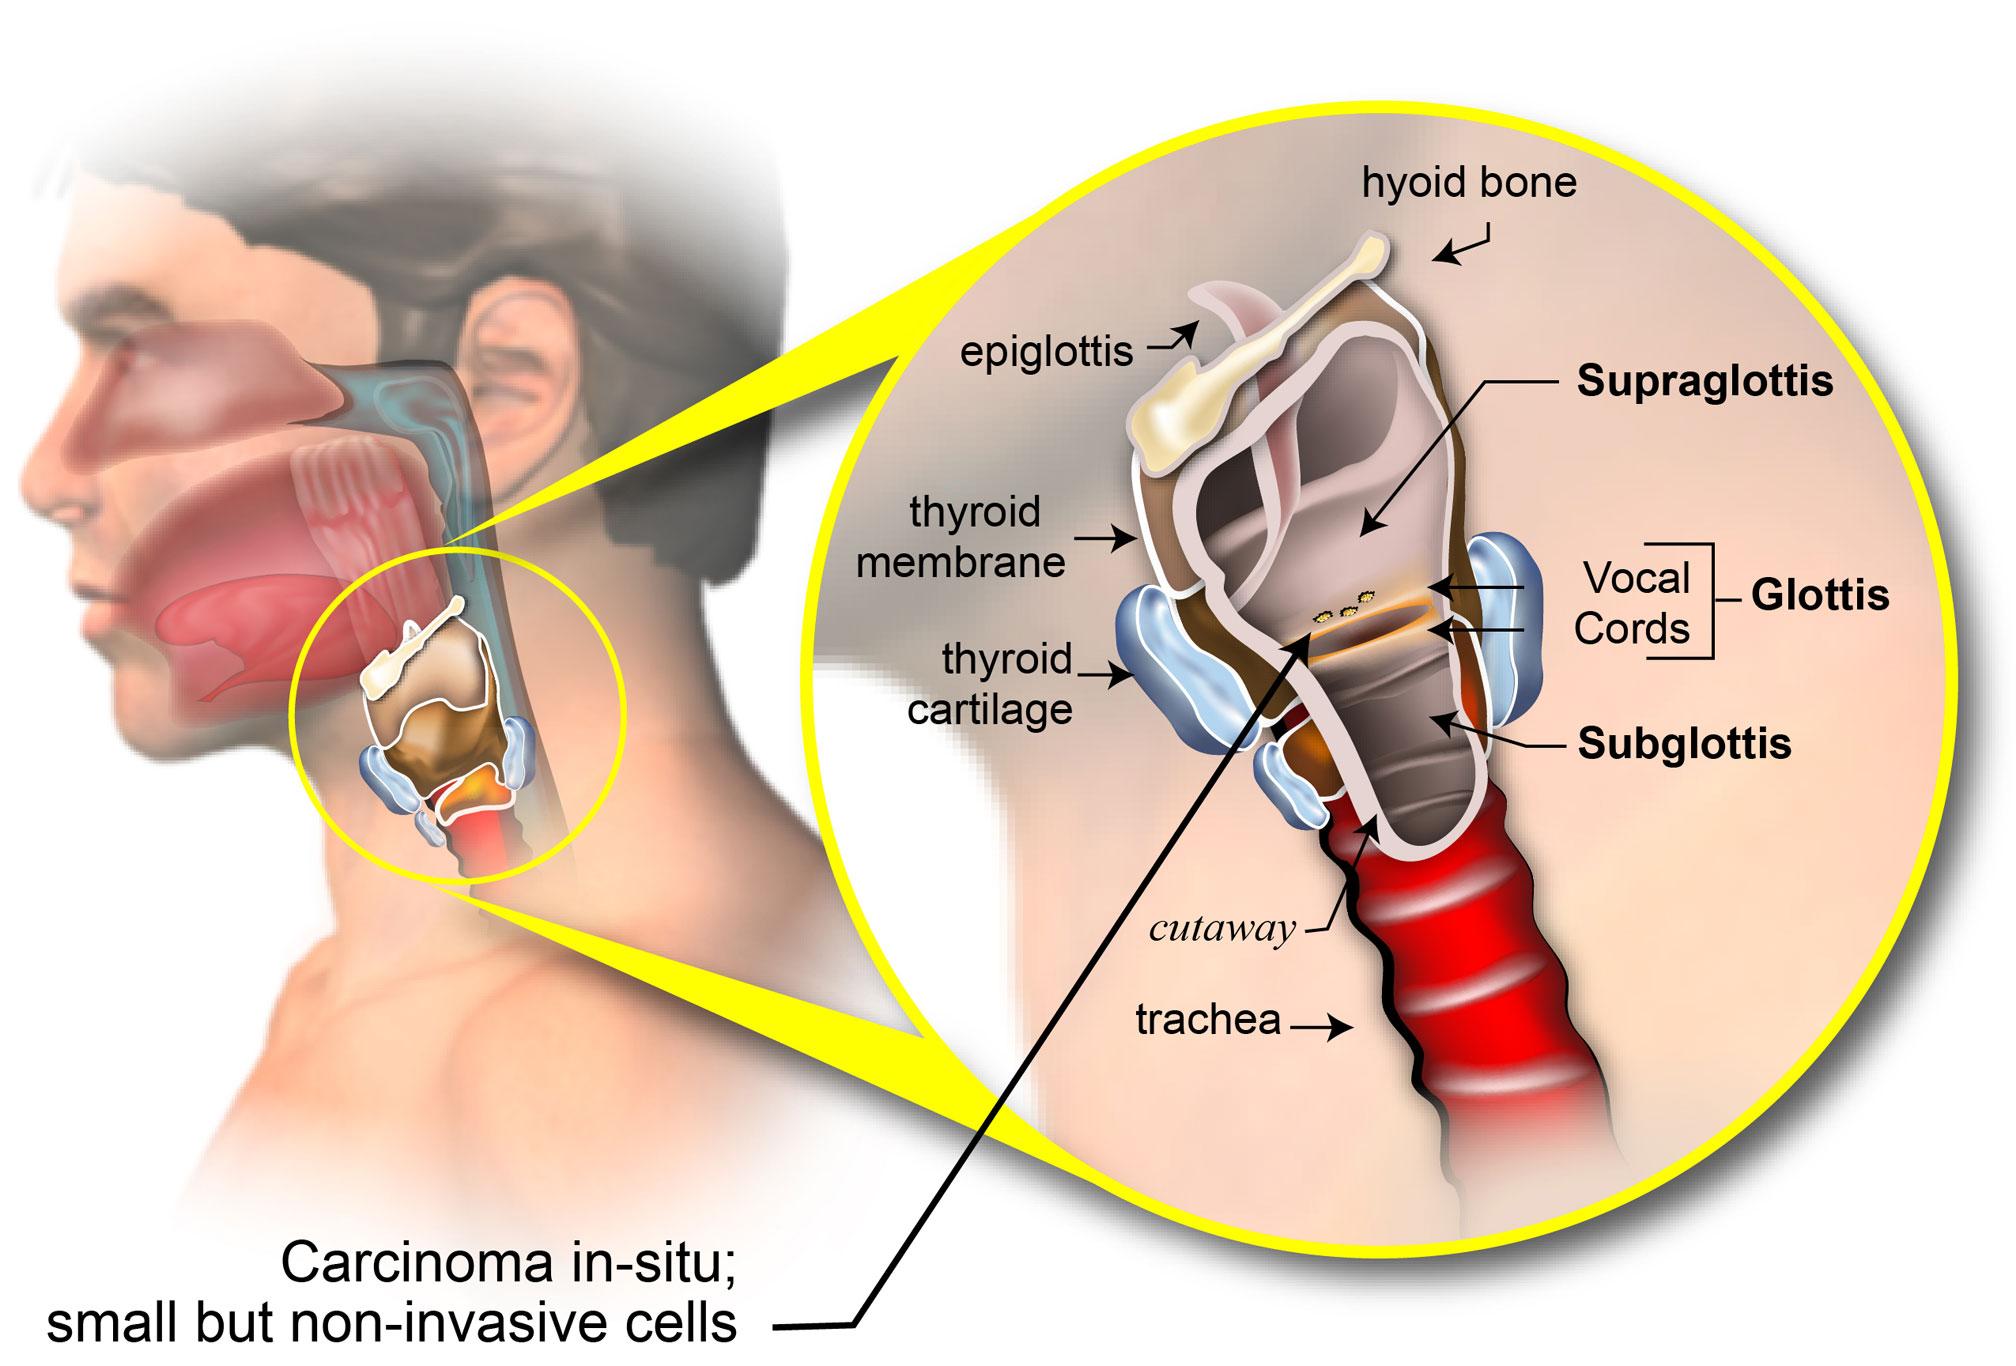 laryngeal papillomatosis lymph nodes